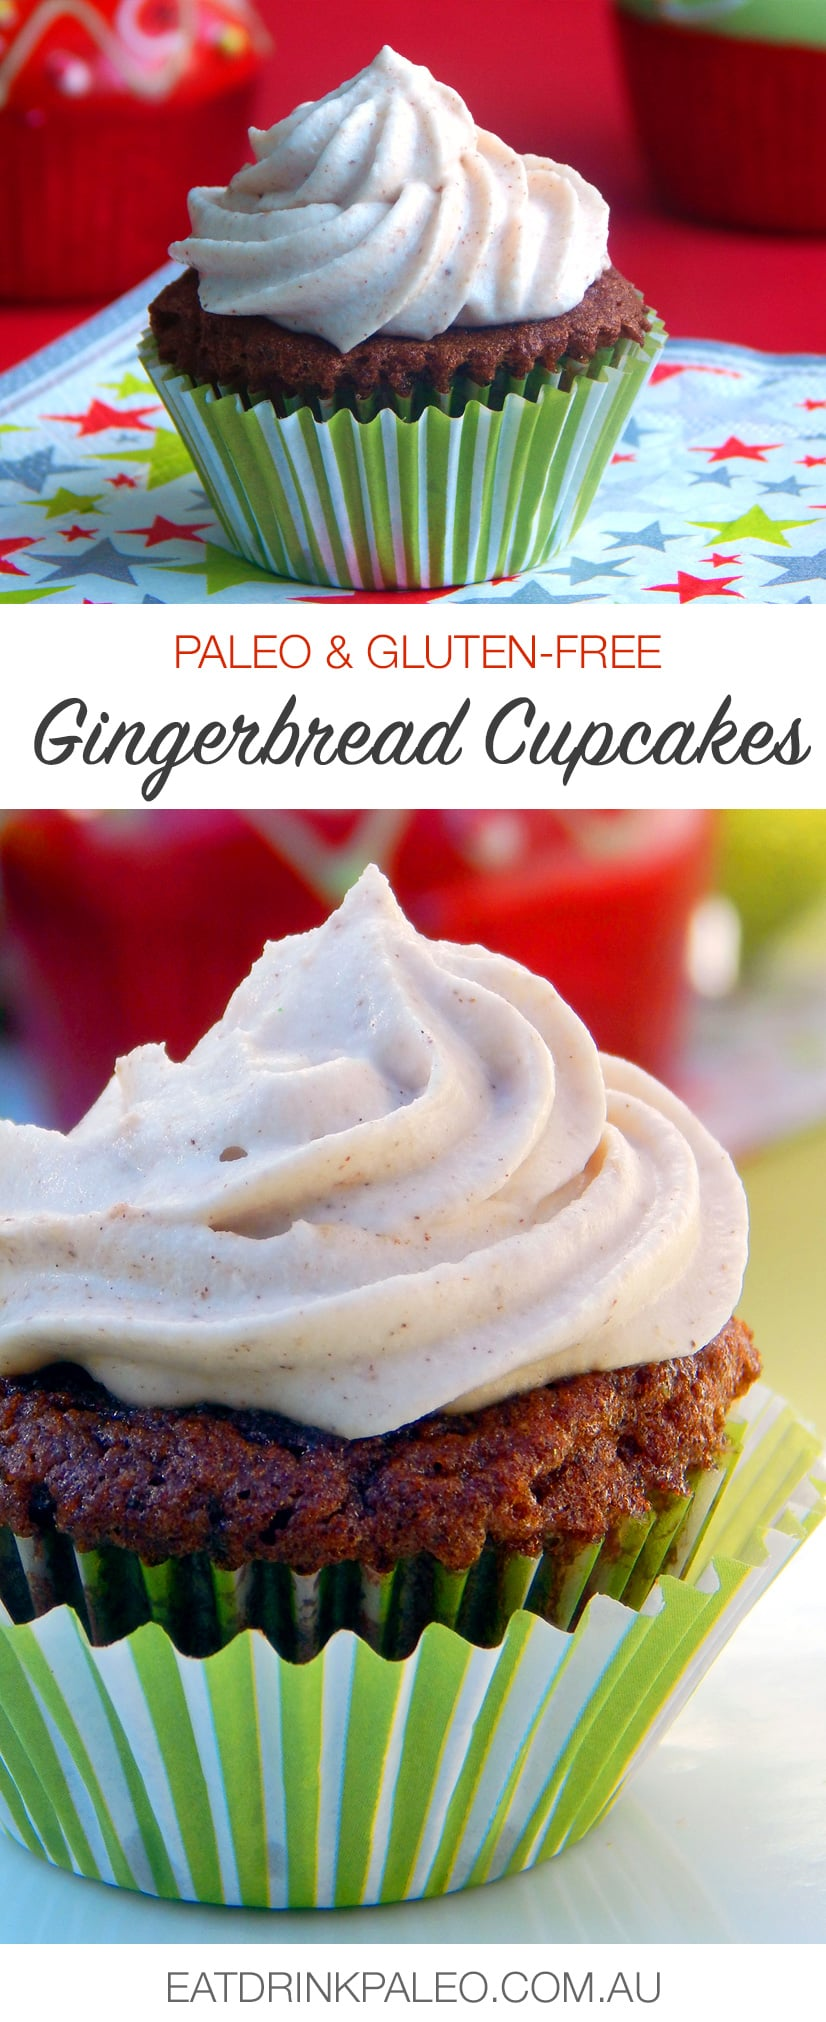 Paleo Gingerbread Cupcakes (Nut-free, gluten-free recipe)